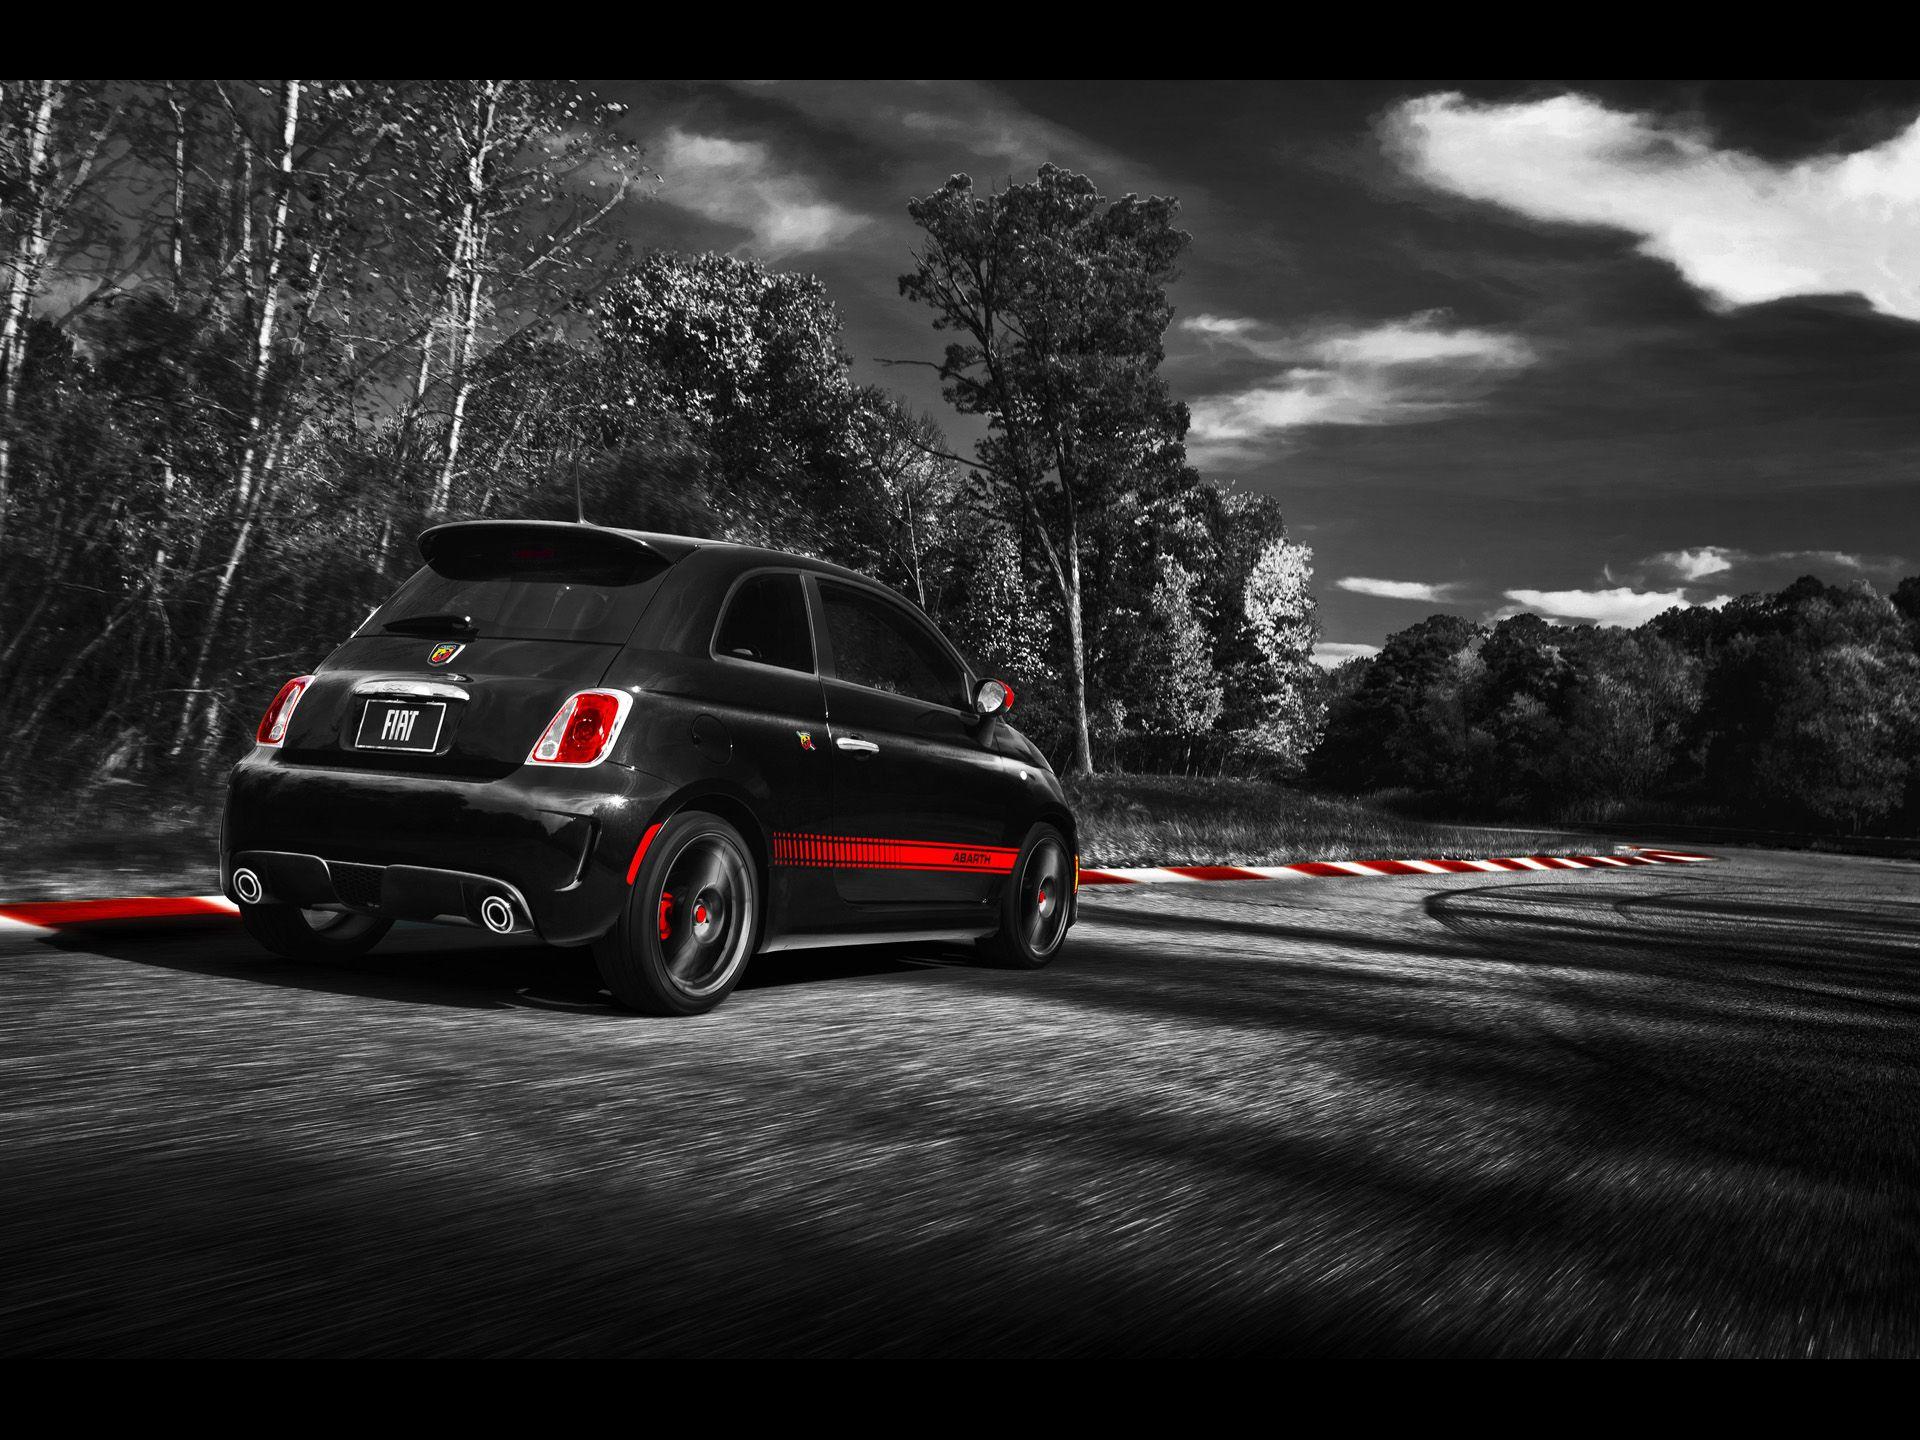 Fiat 500 Abarth Wallpaper 2 Avec Images